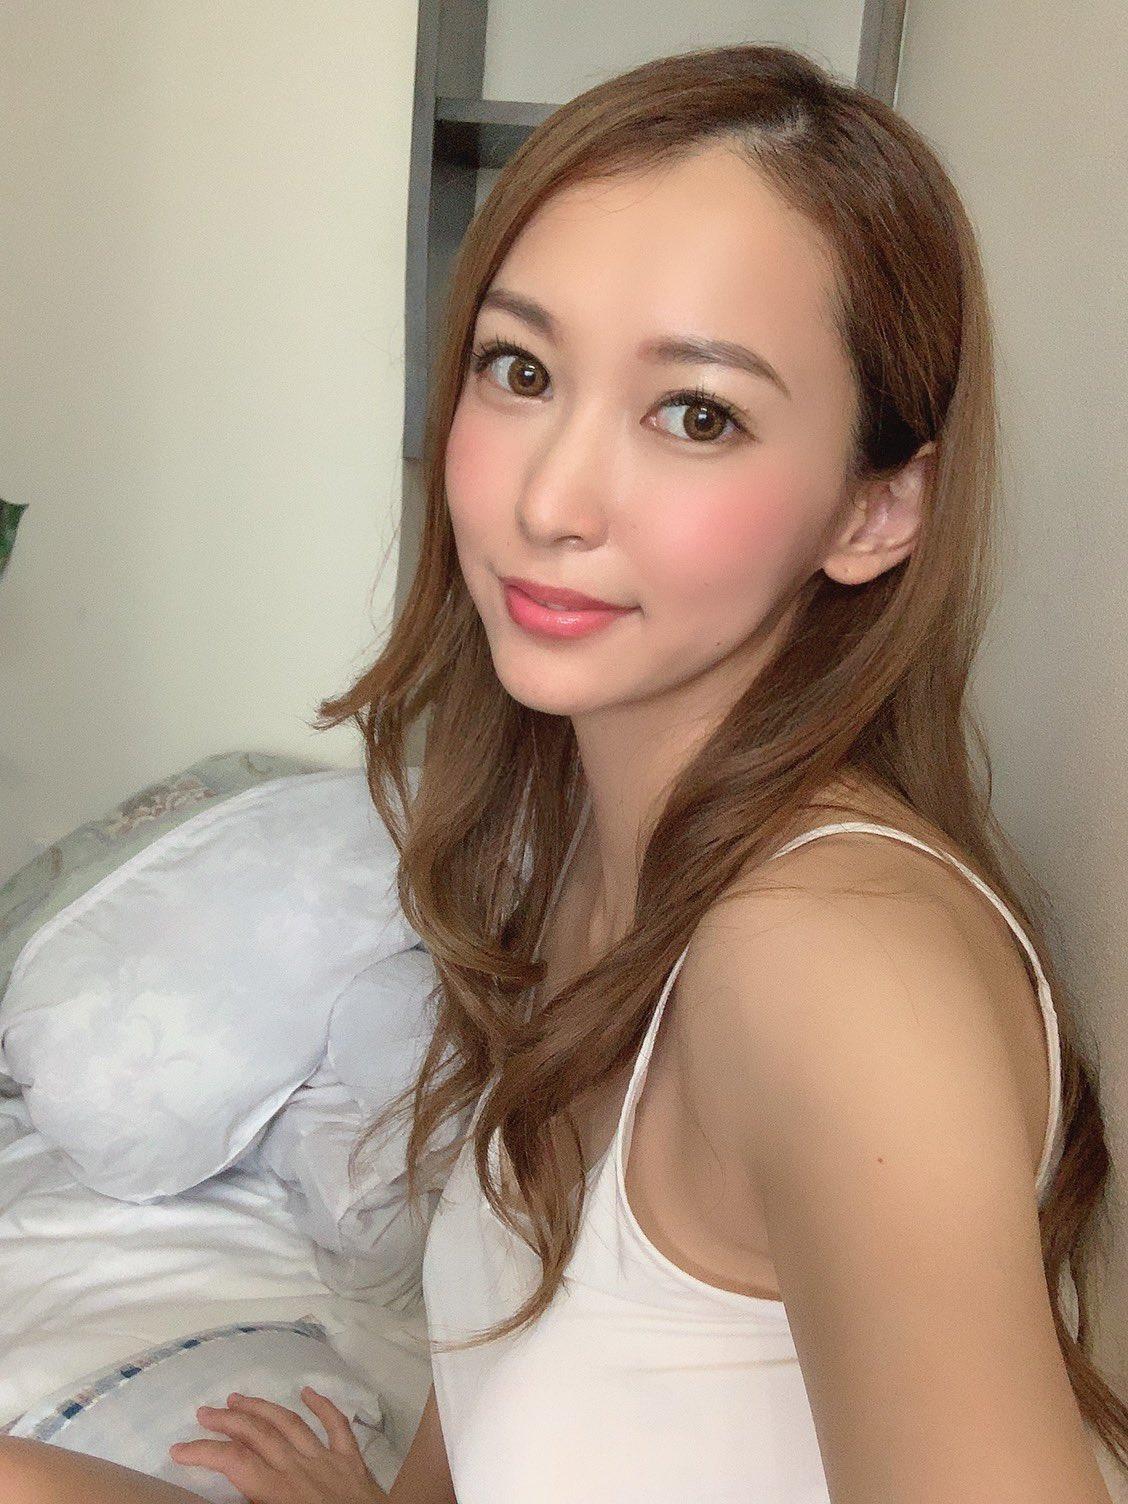 YUZUKI 優月 - ScanLover 2.0 - Discuss JAV & Asian Beauties!